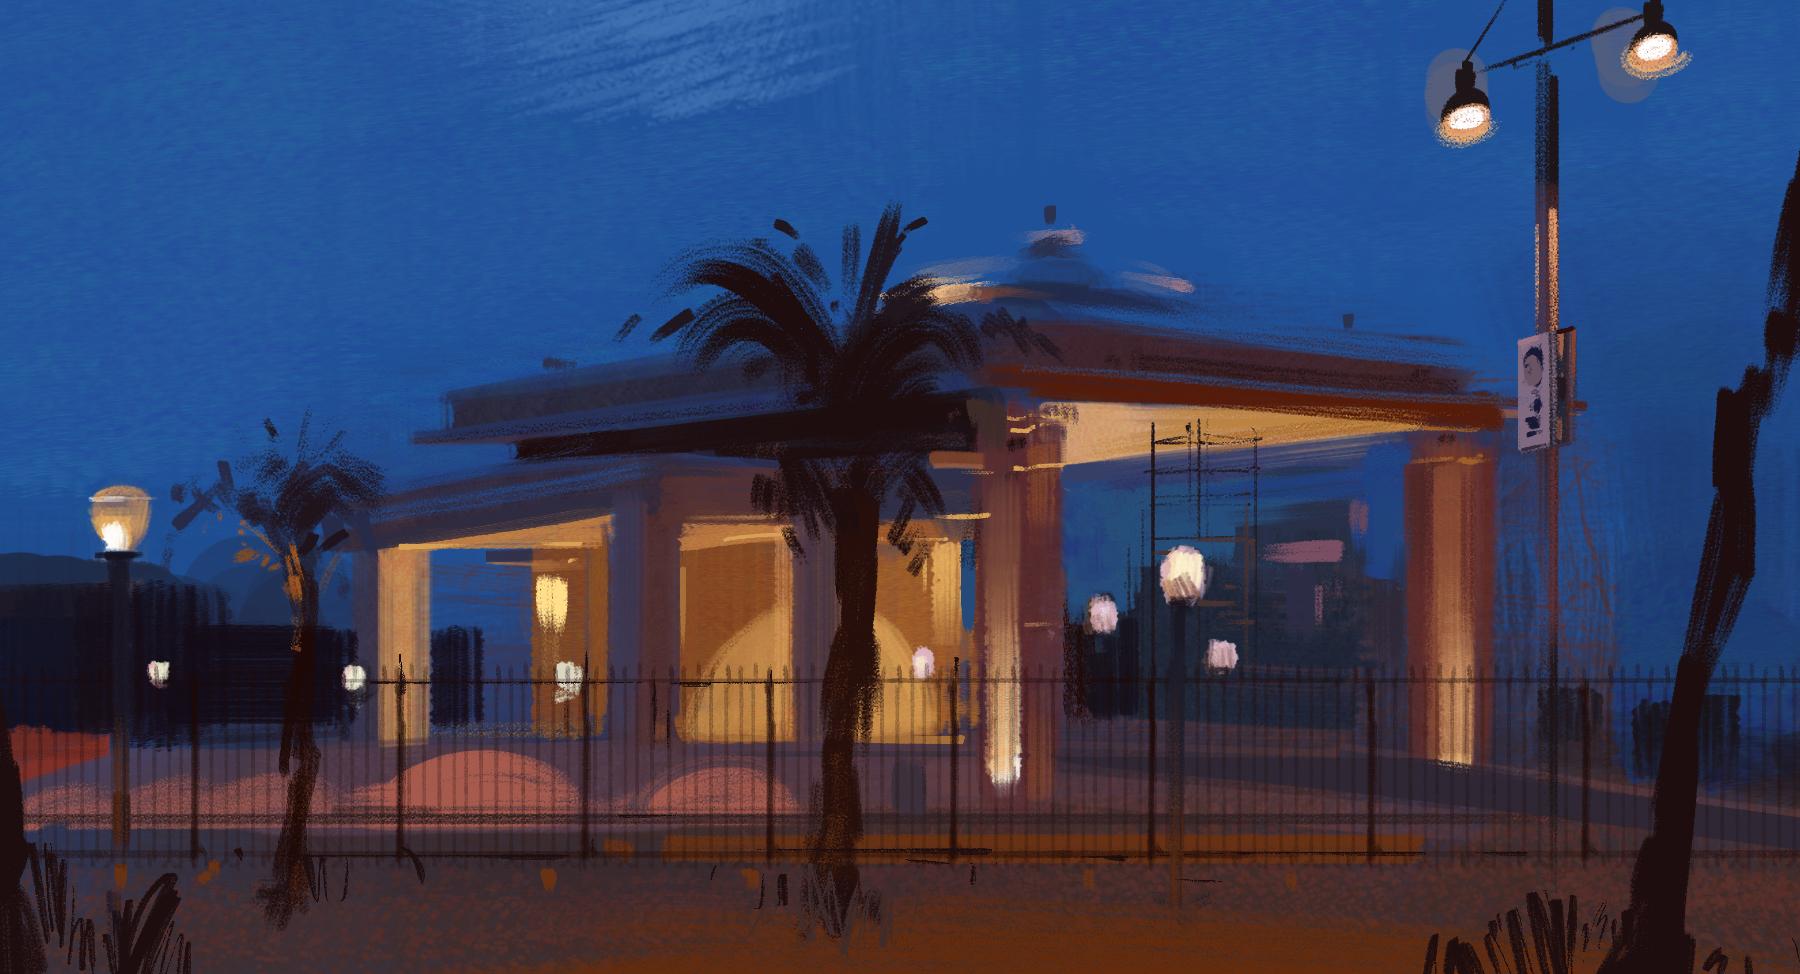 NightStudy.jpg